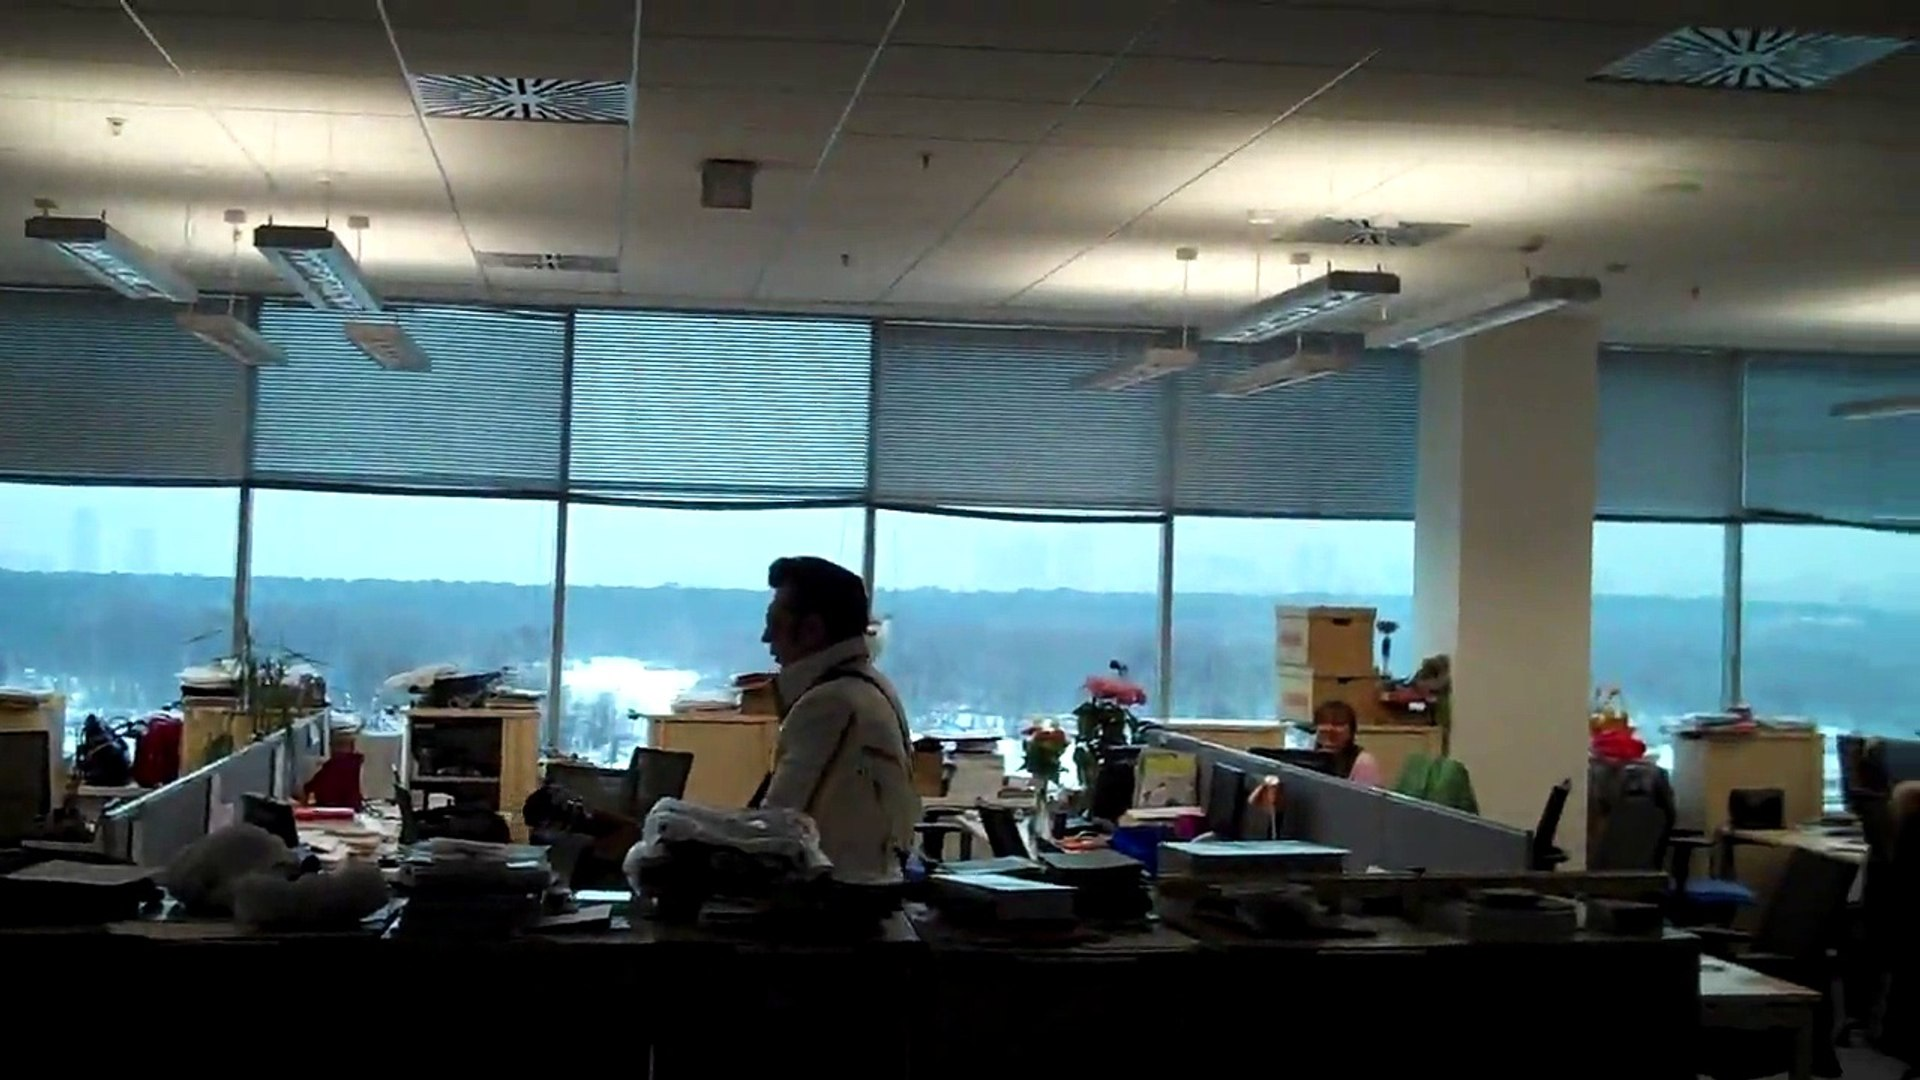 Дед Мороз и Элвис в  офисе Microsoft Russia, 25 декабря 2010